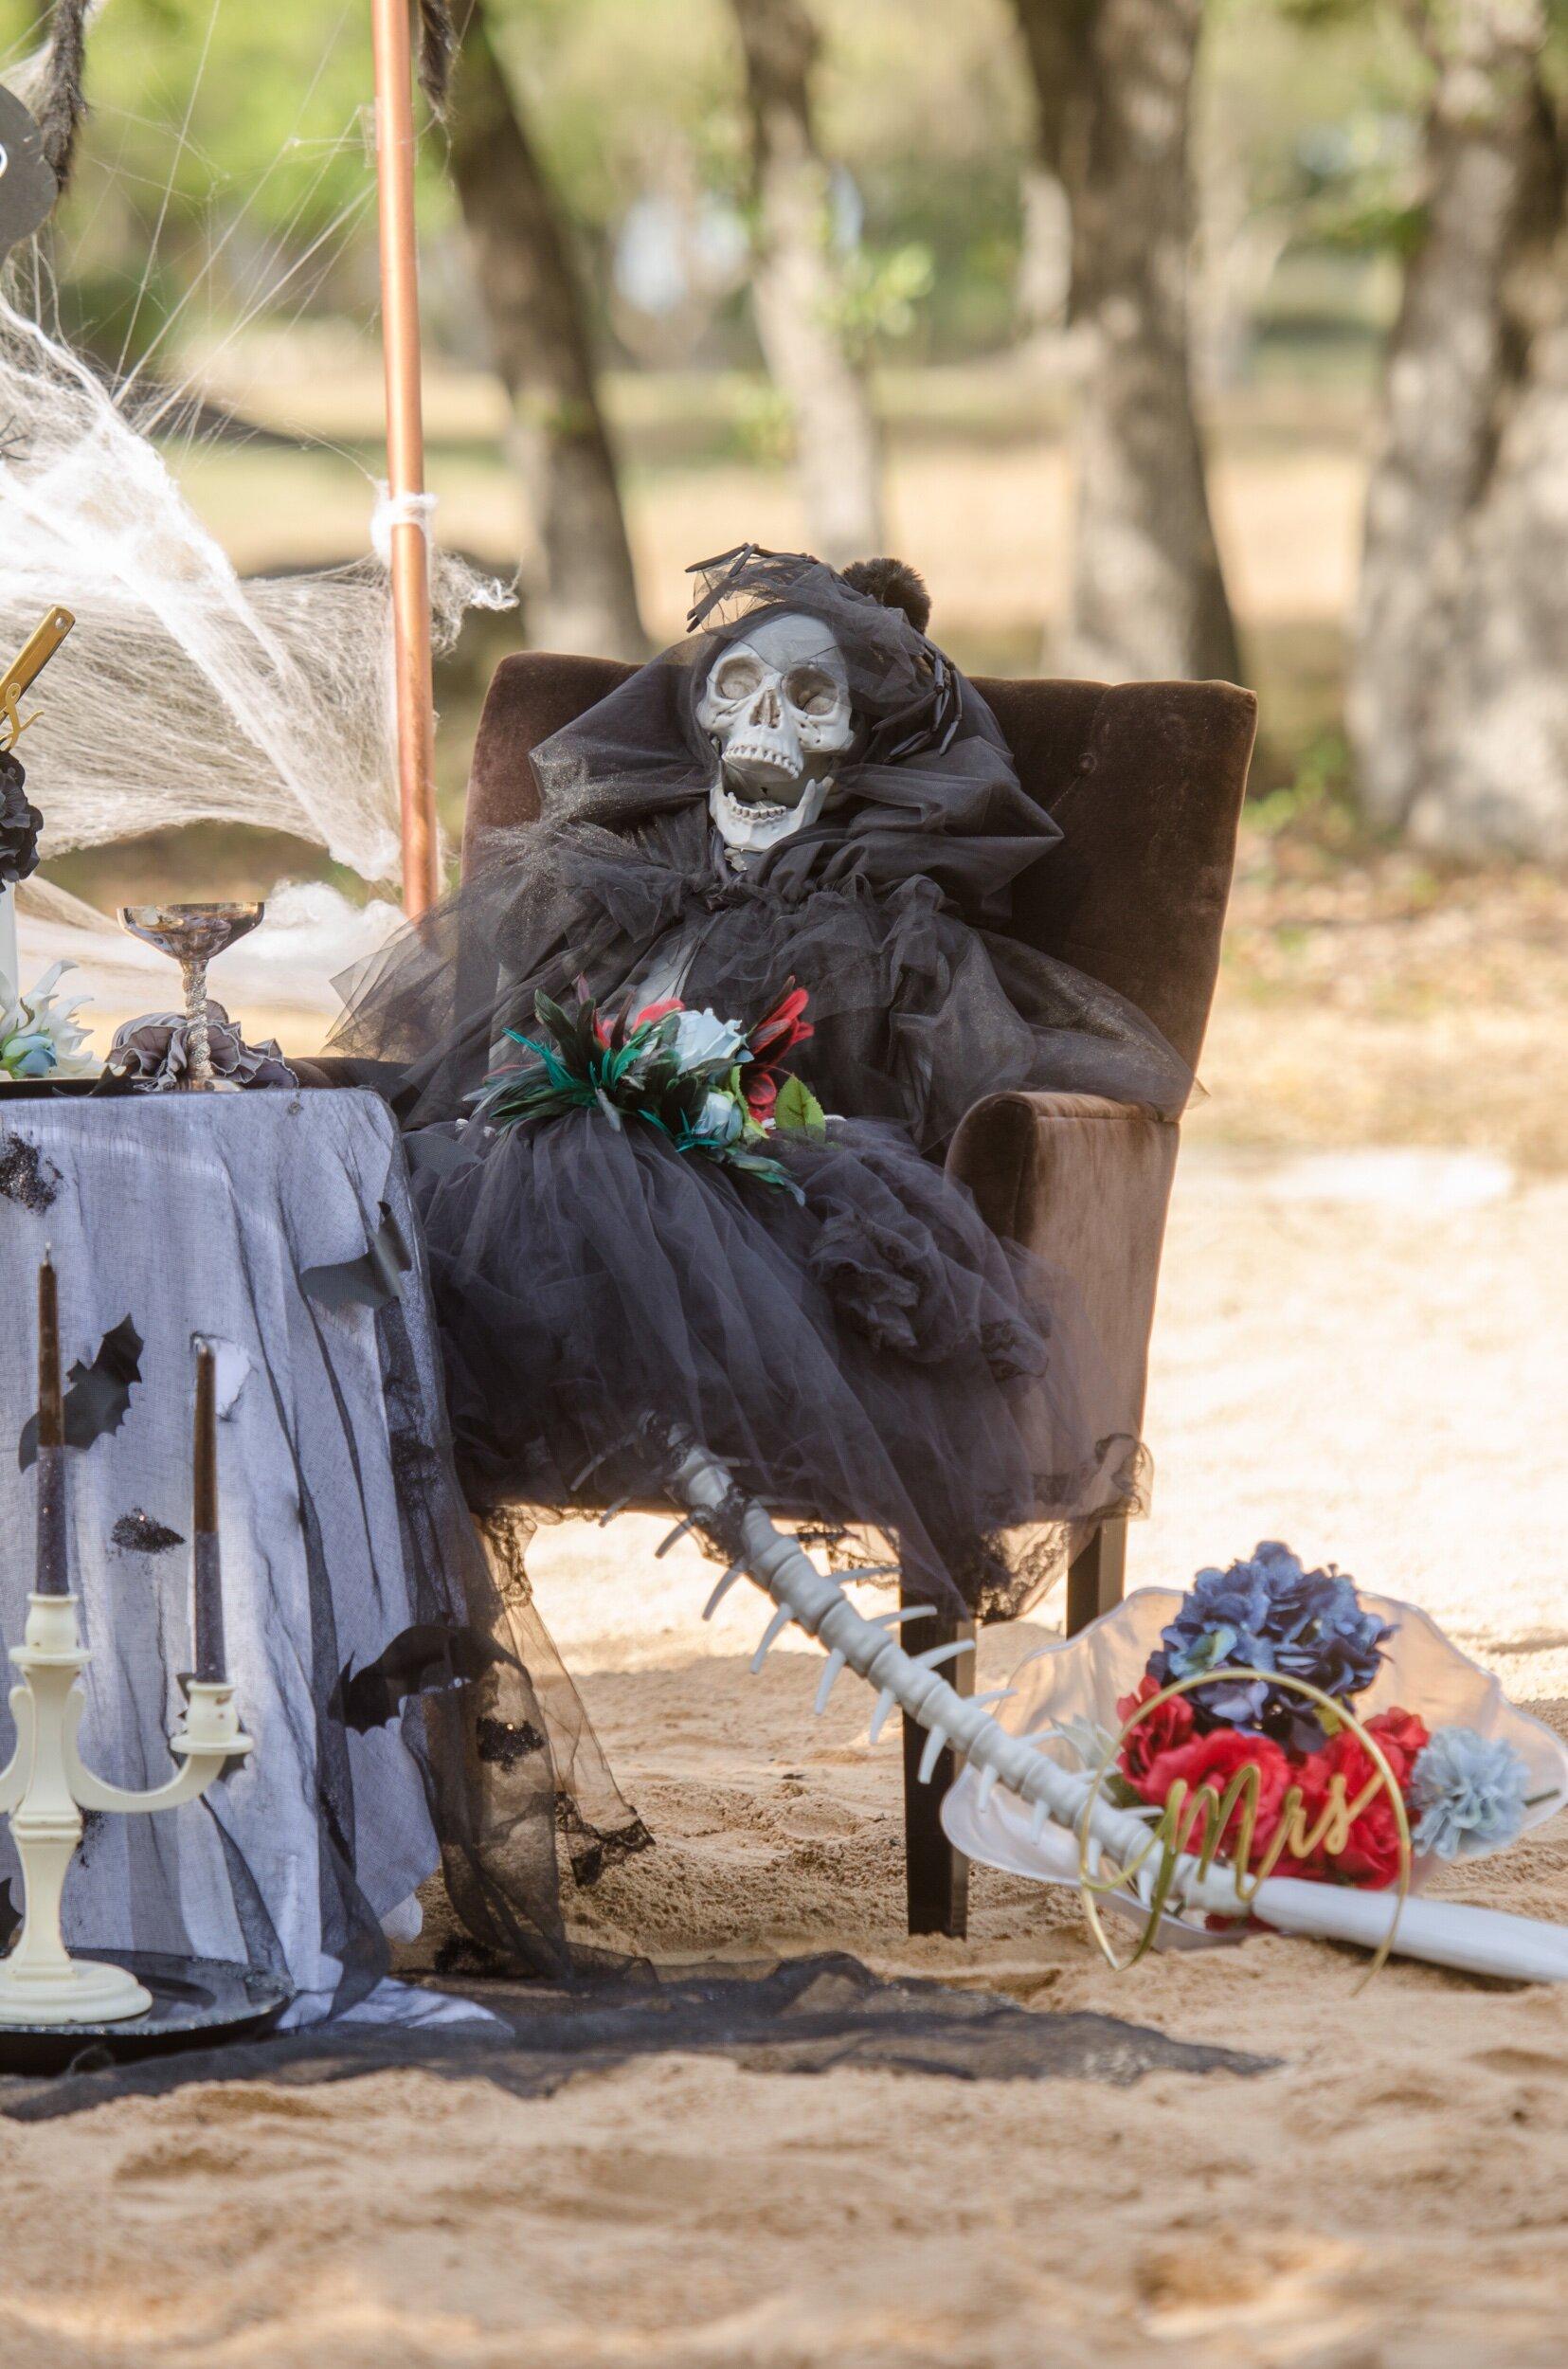 Mermaid skeleton gothic wedding idea - as seen on Mint Event Design